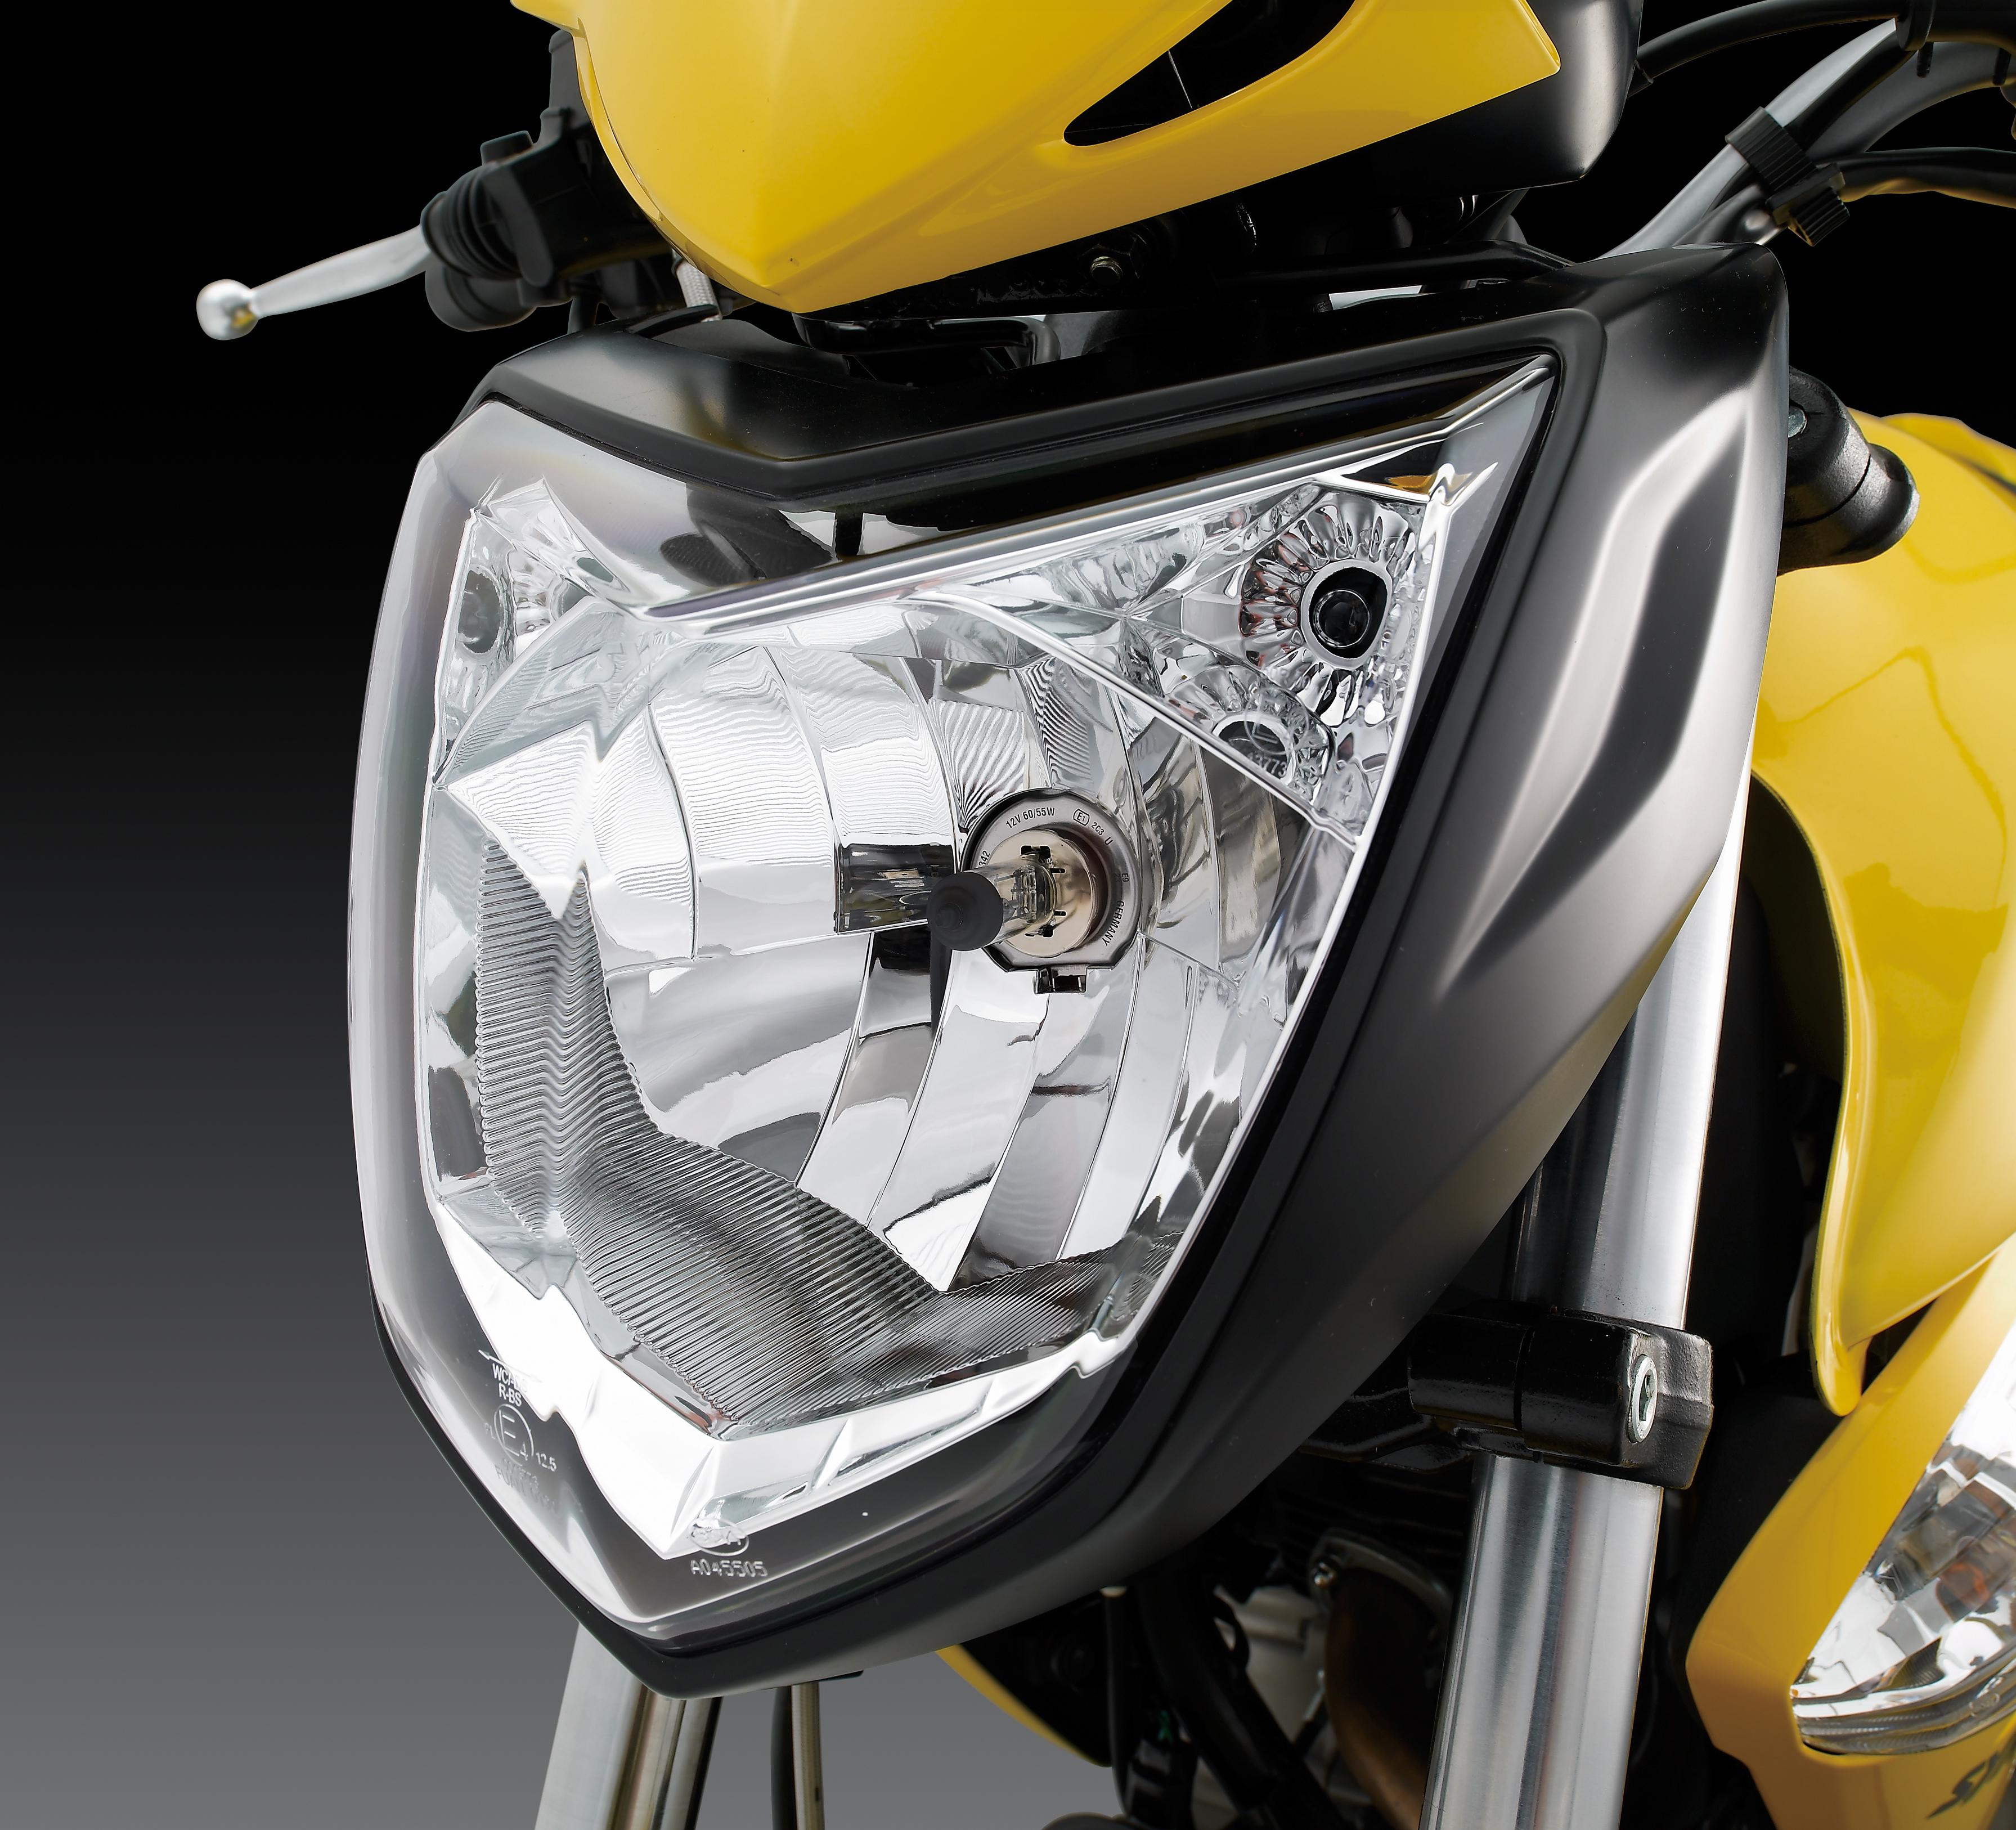 Yellow Sym T2 250i_Scoots